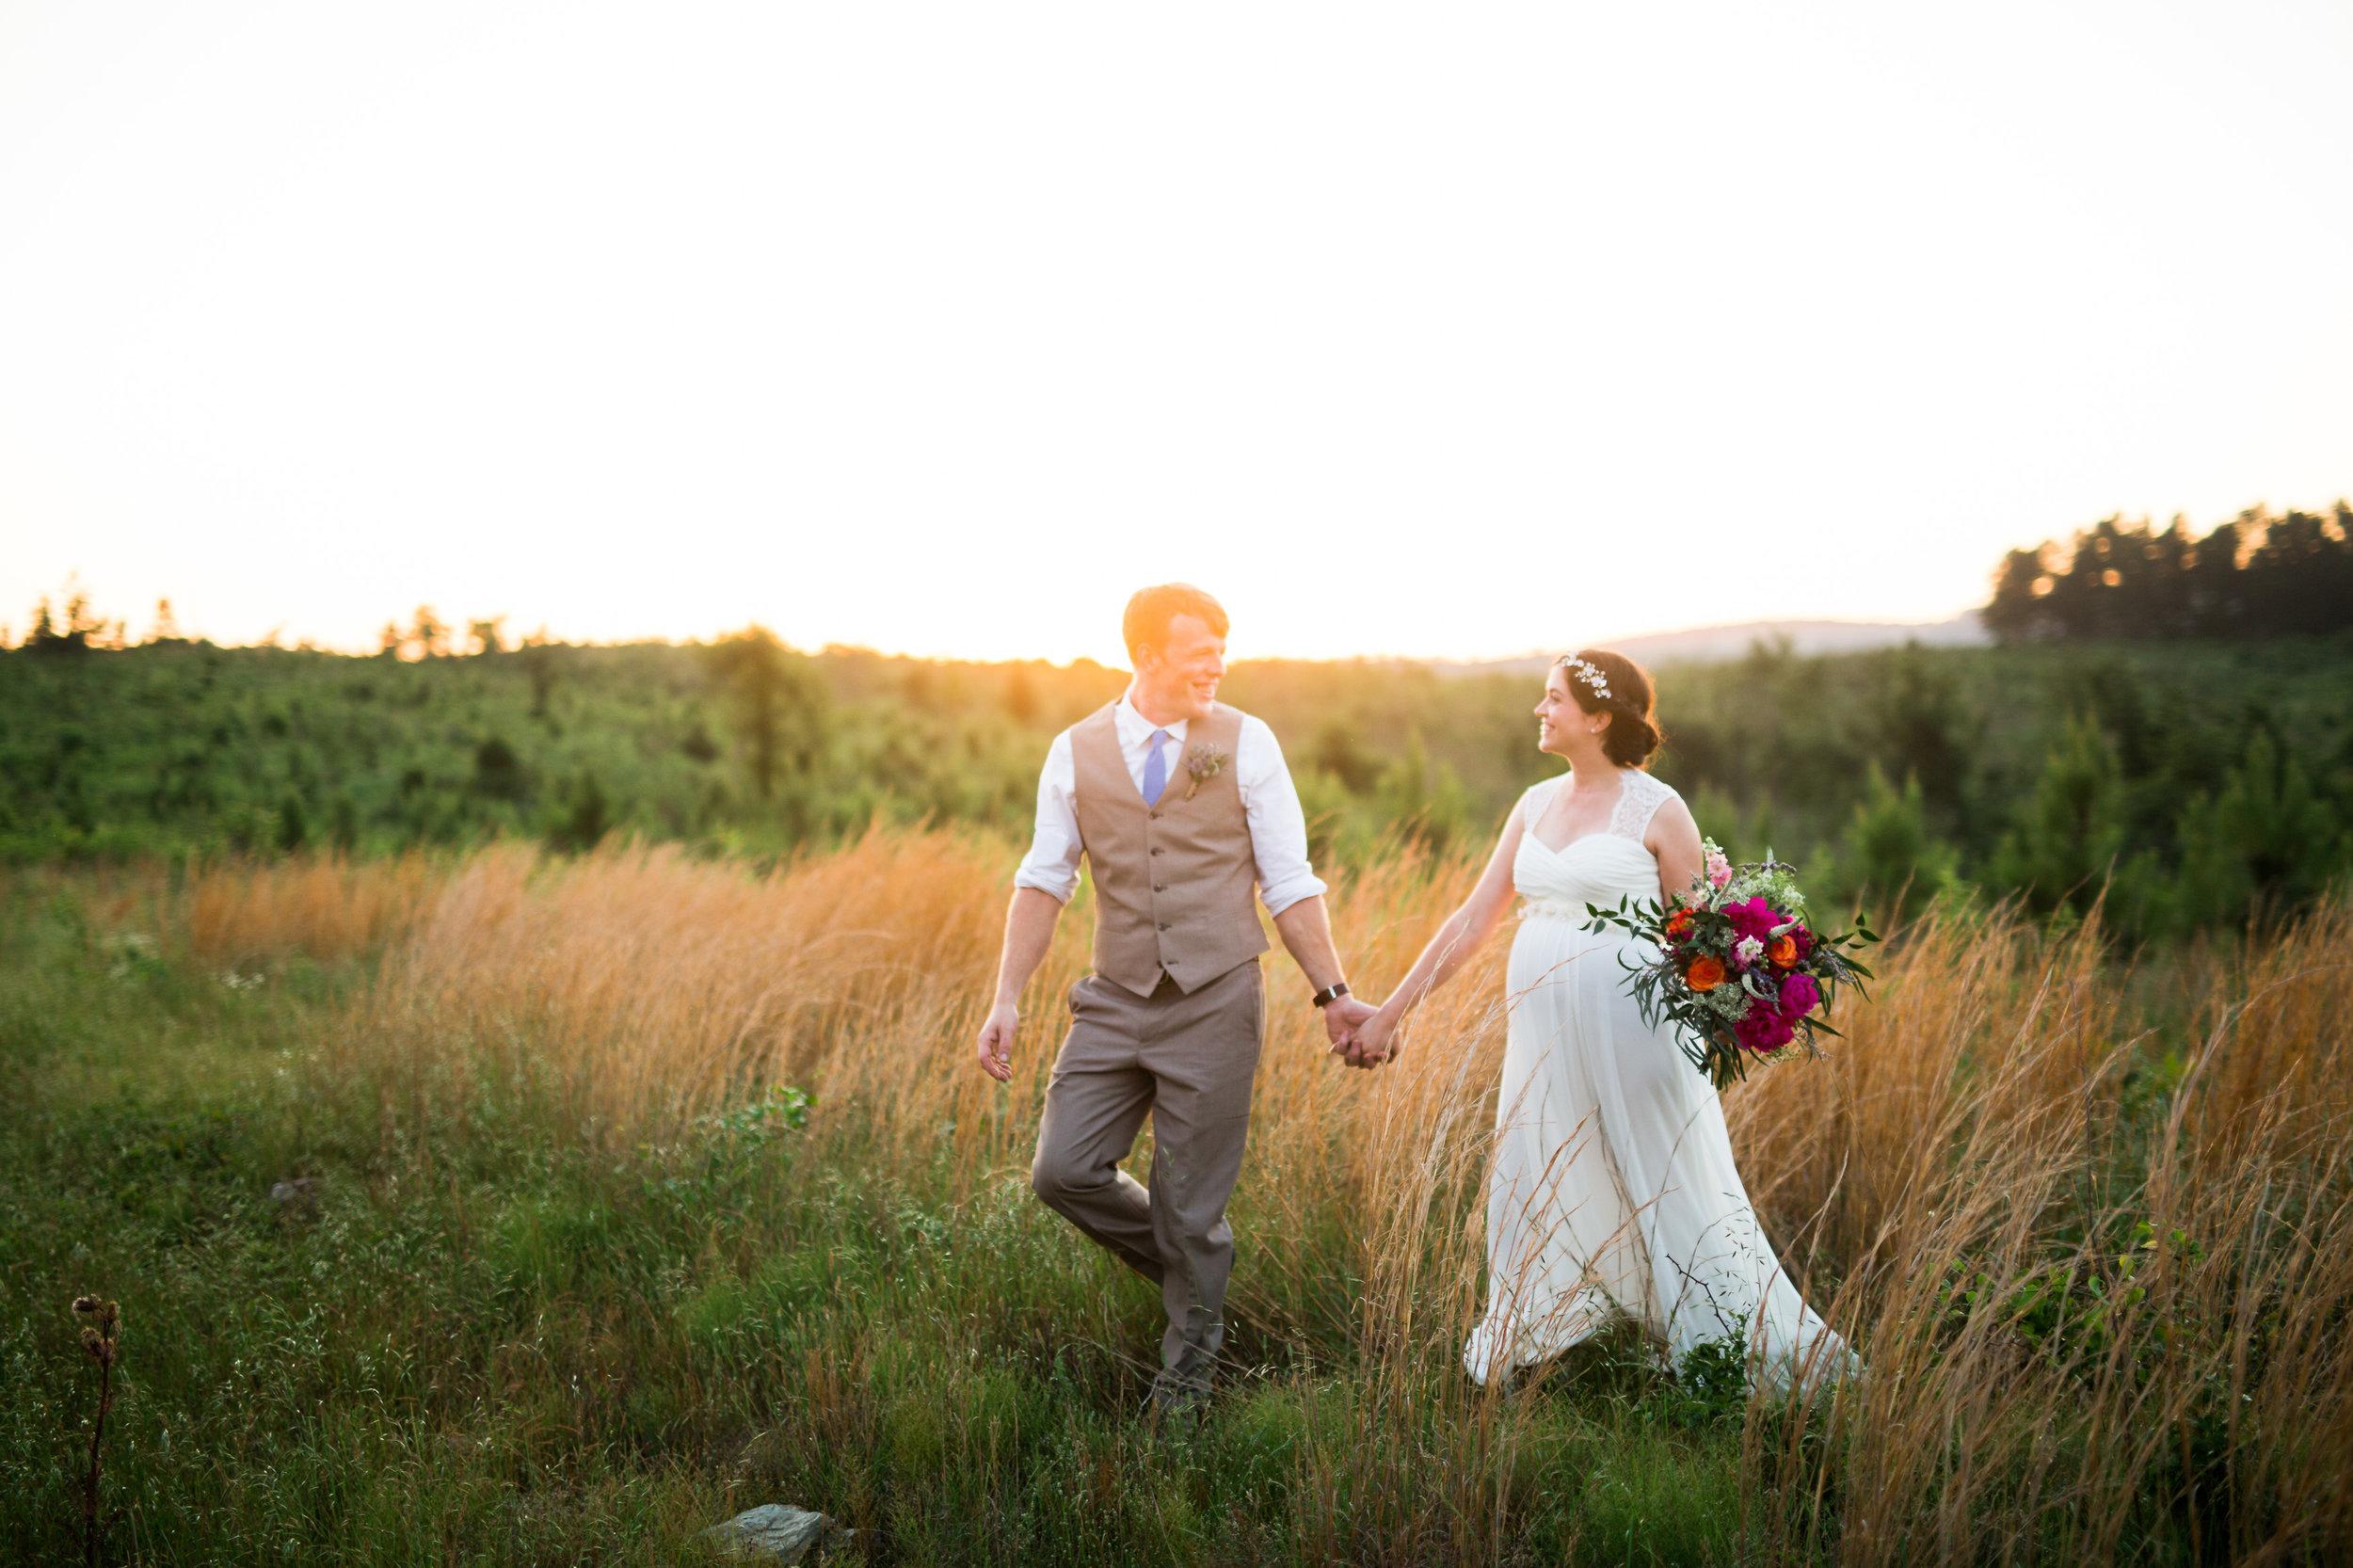 megginson_wedding_app2017-388.jpg